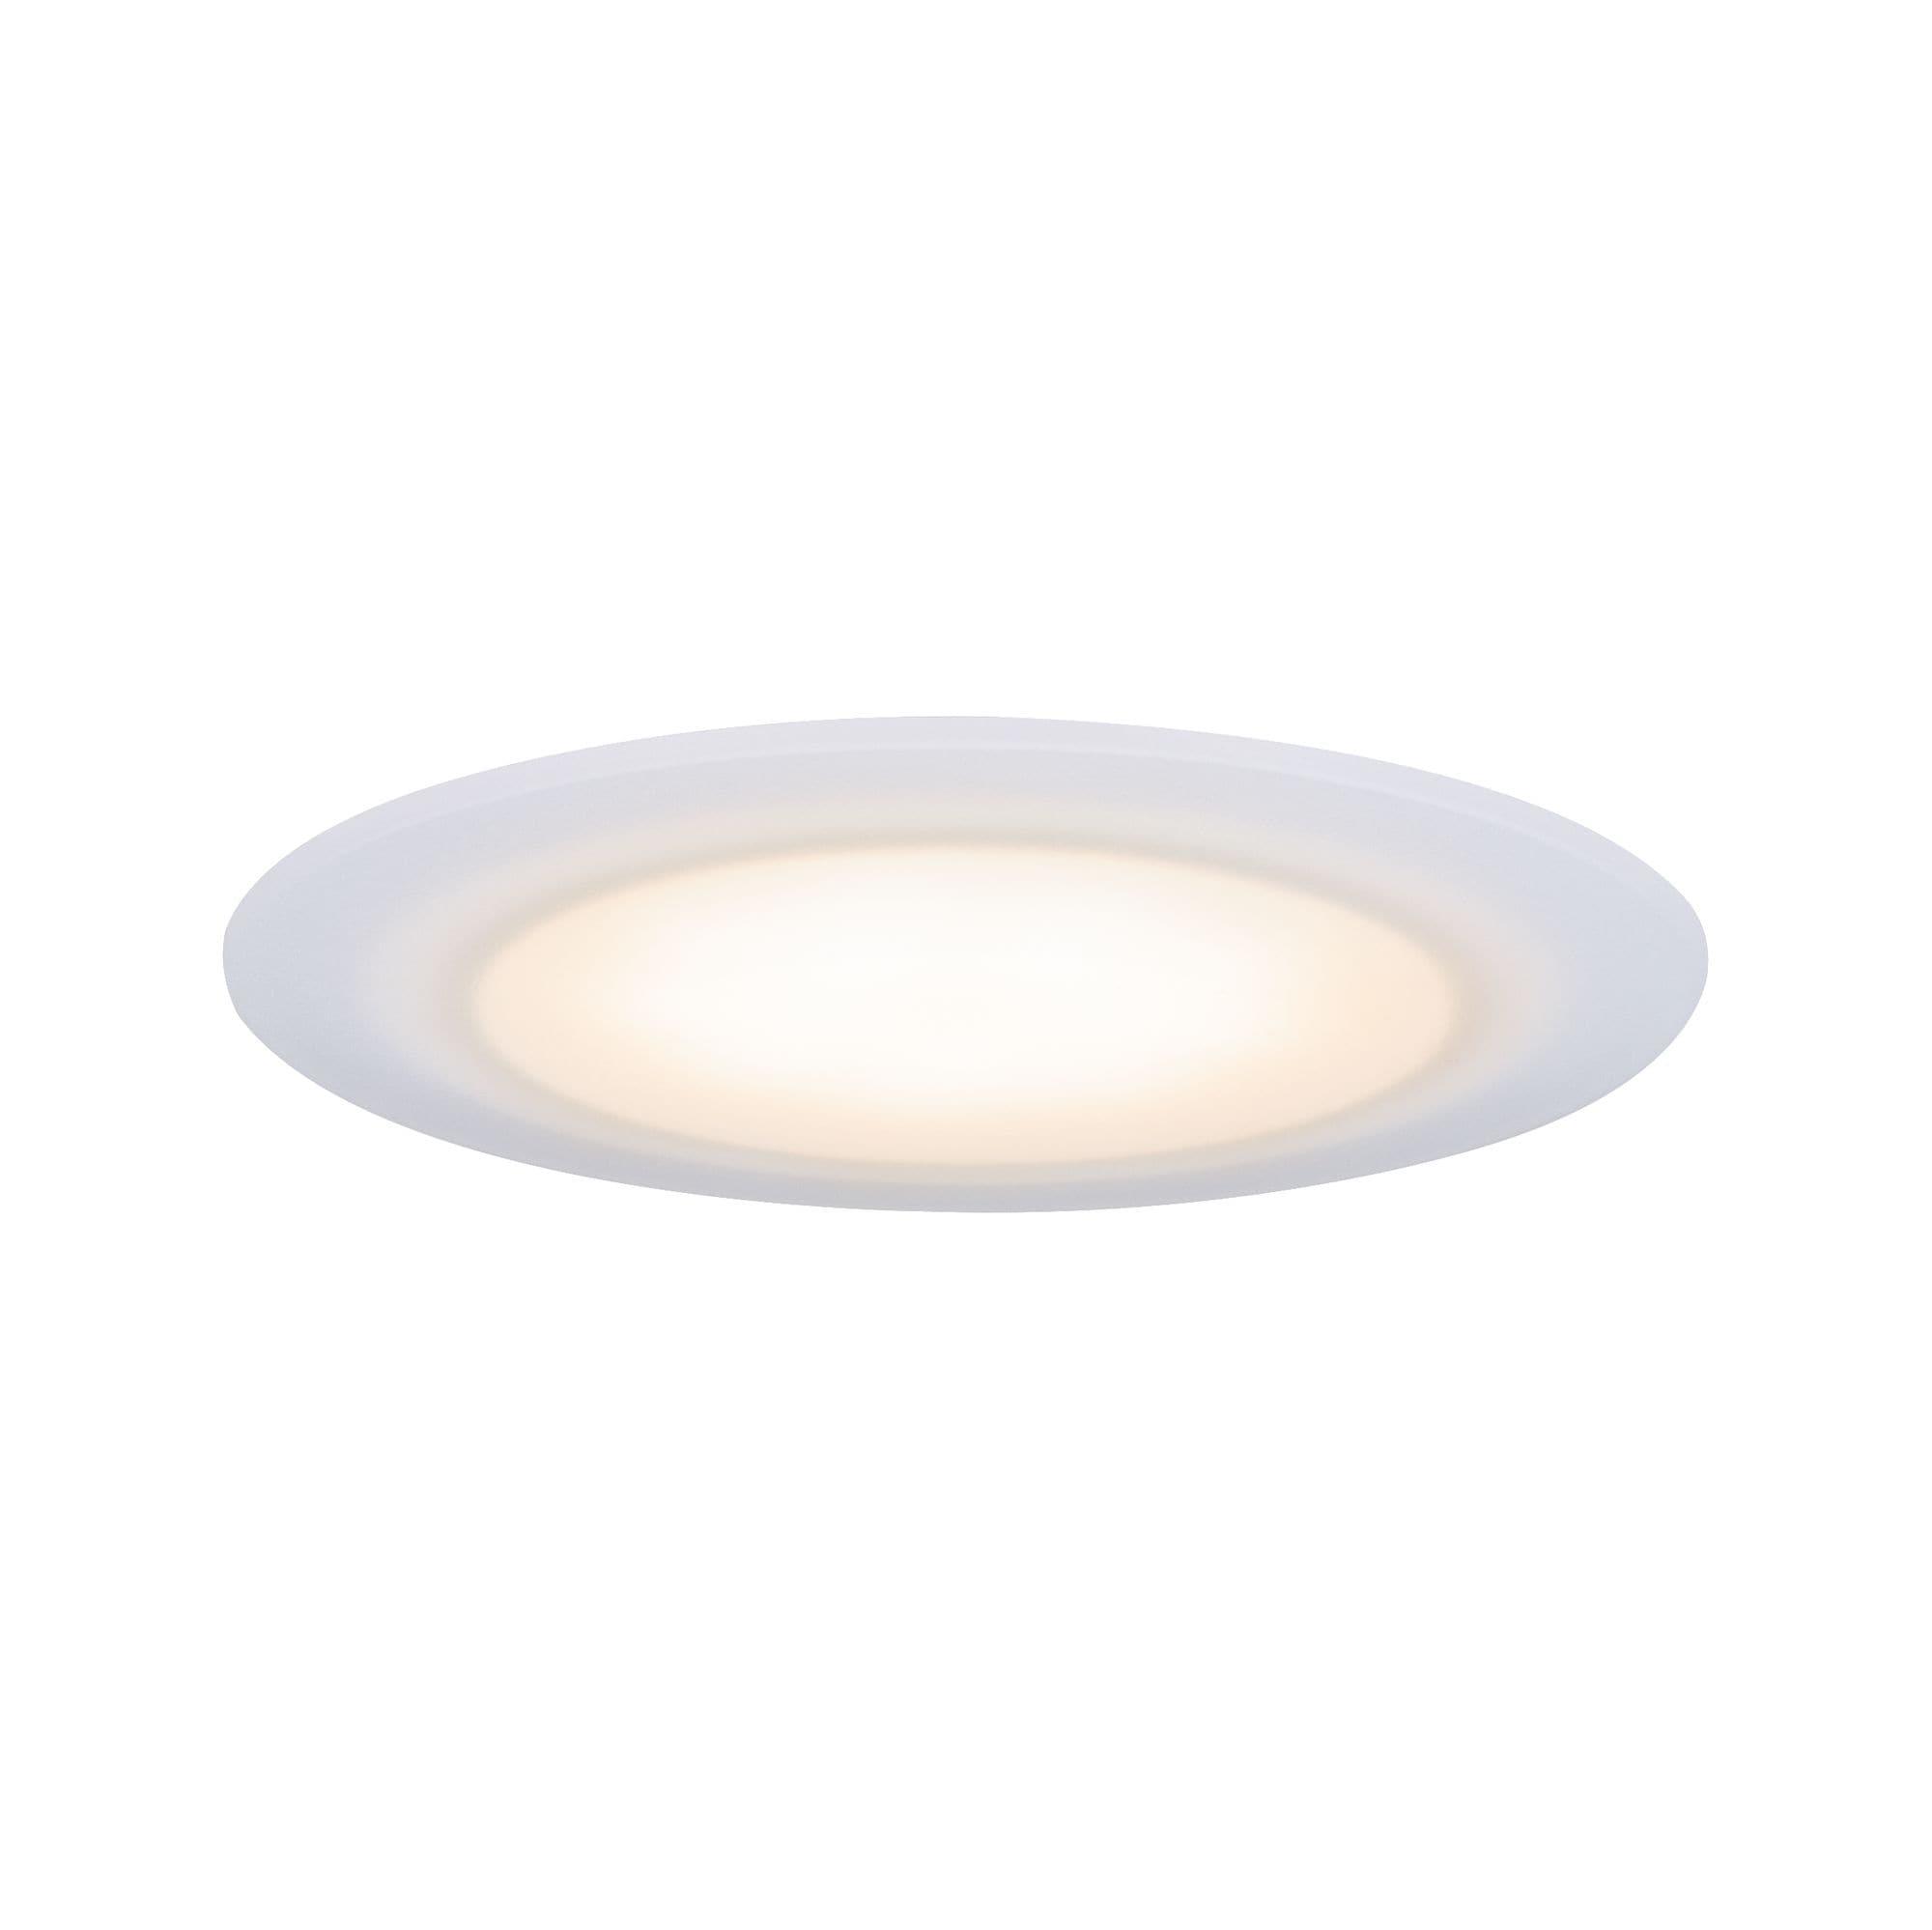 Paulmann,LED Einbaustrahler Suon WarmDim 2000-2700K 6,5W 230 V Satiniert